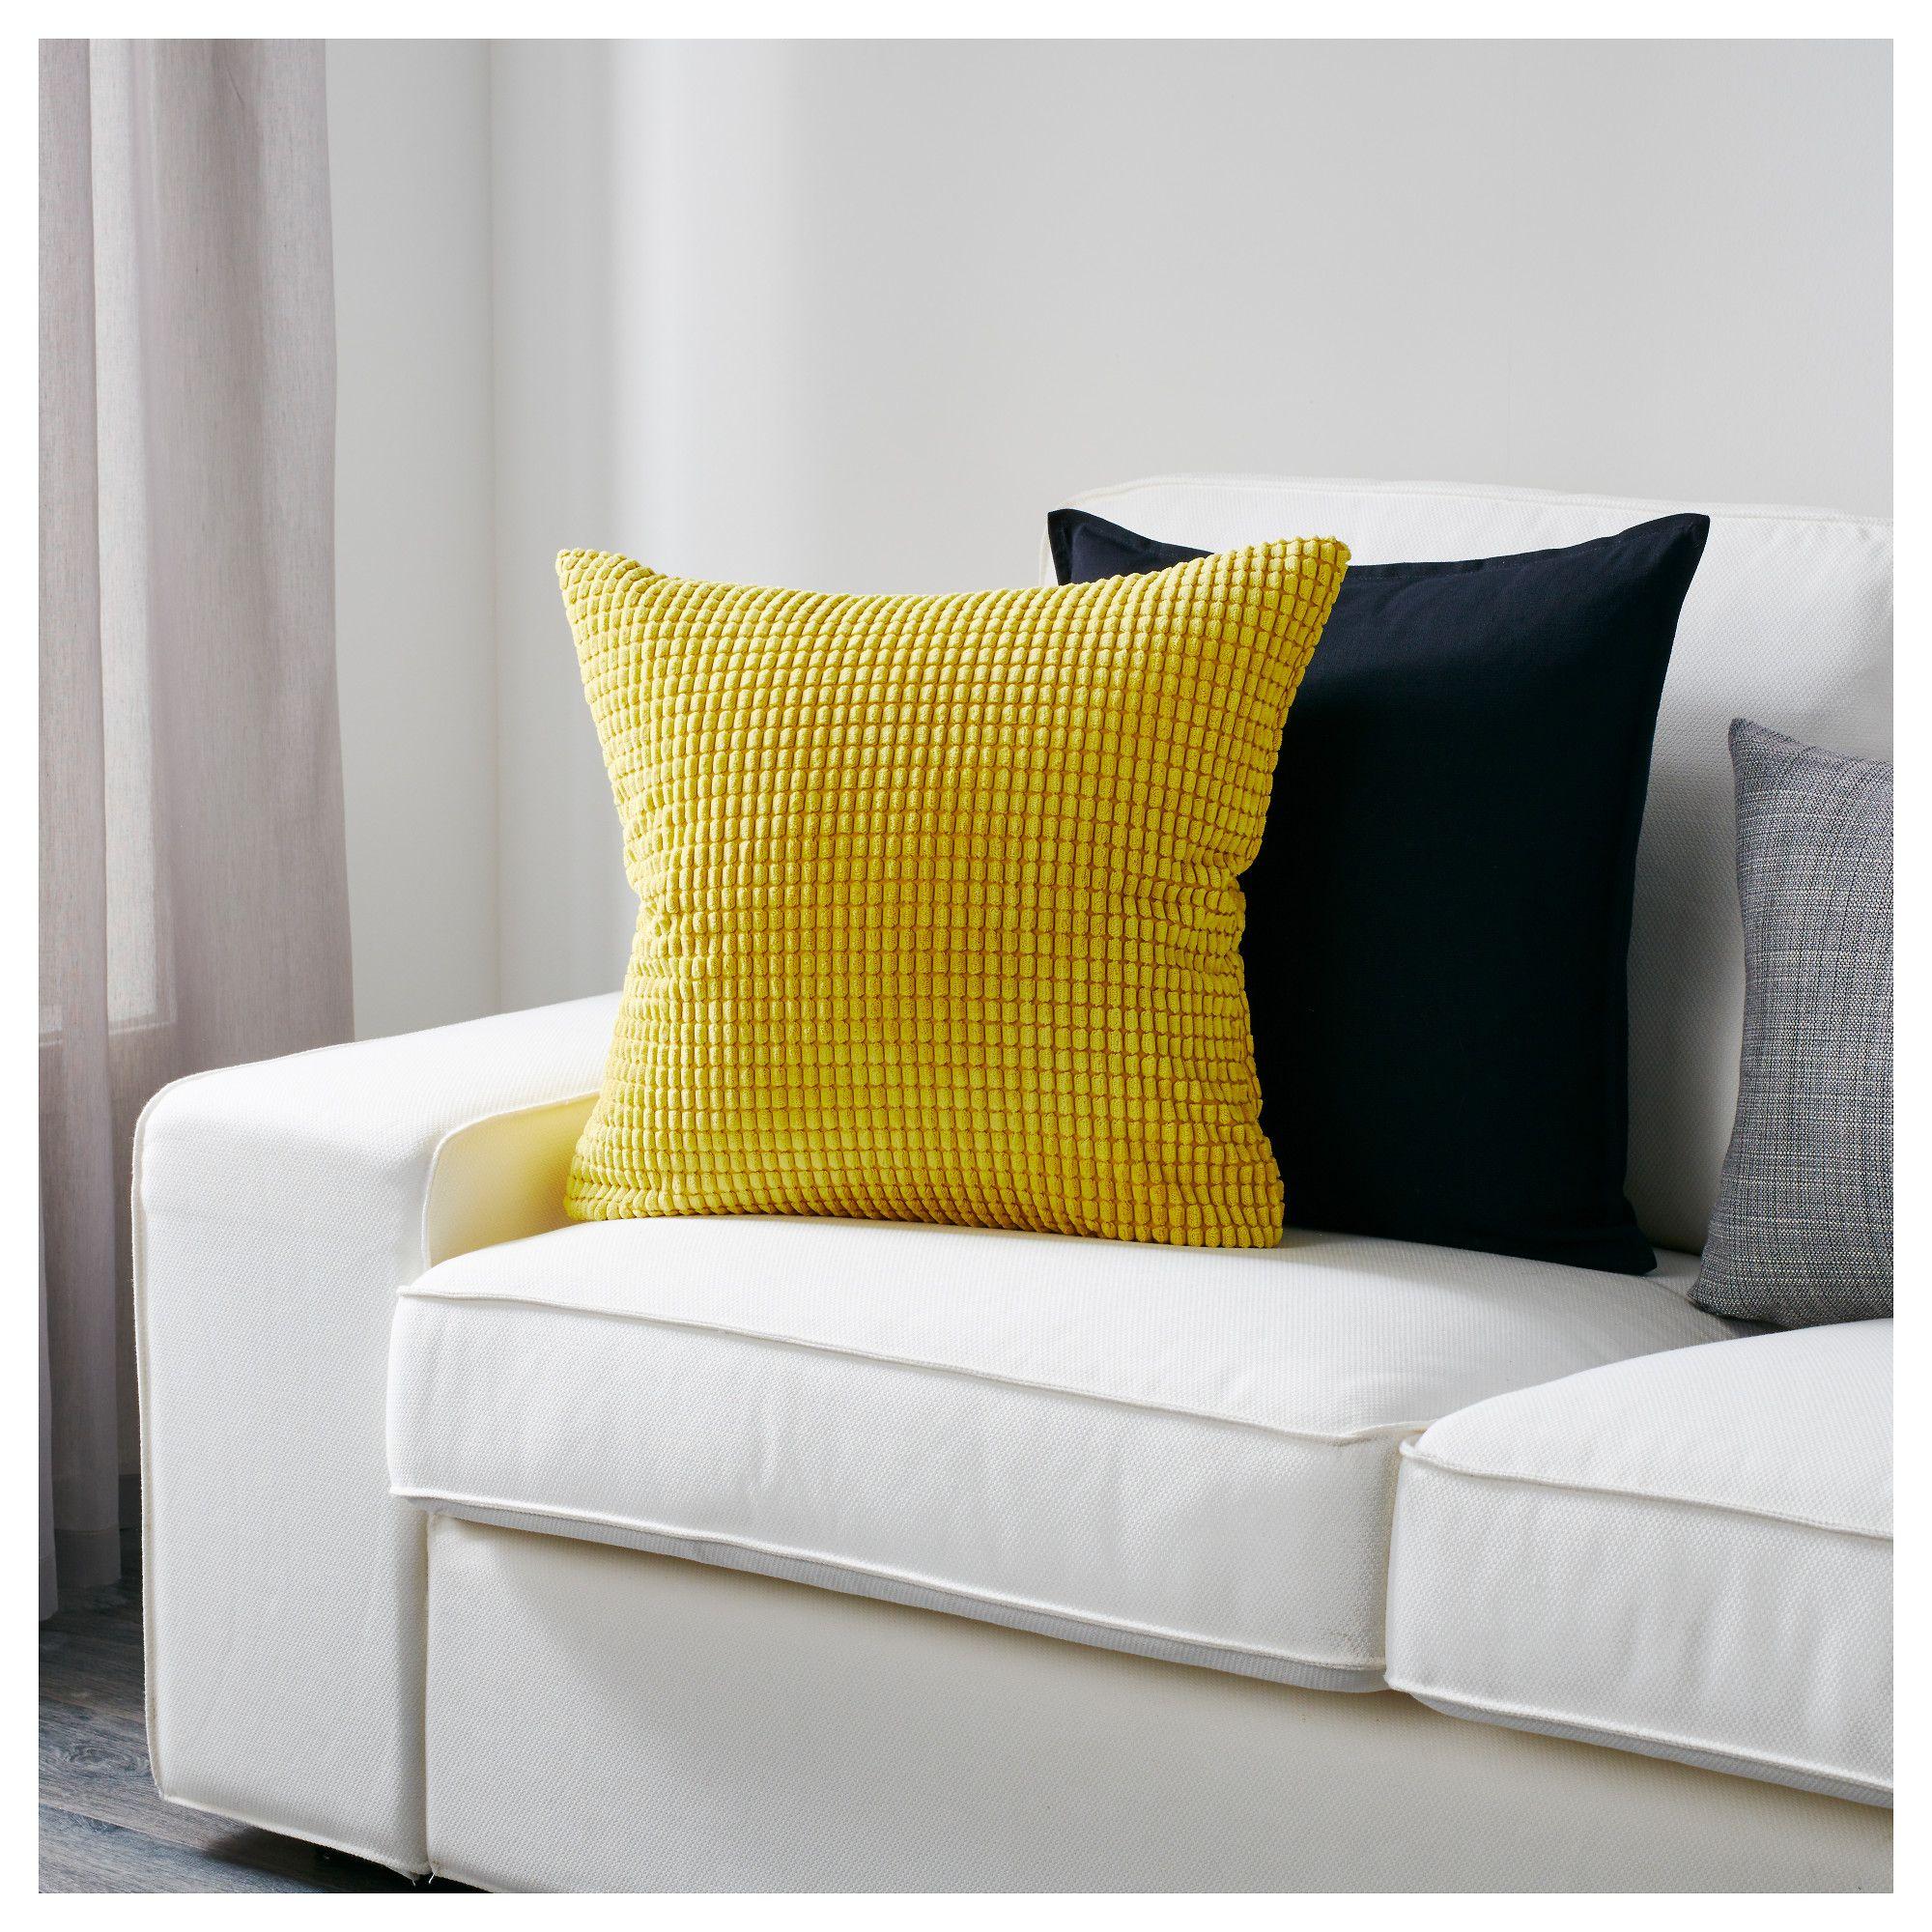 Gullklocka cushion cover yellow 20x20 50x50 cm